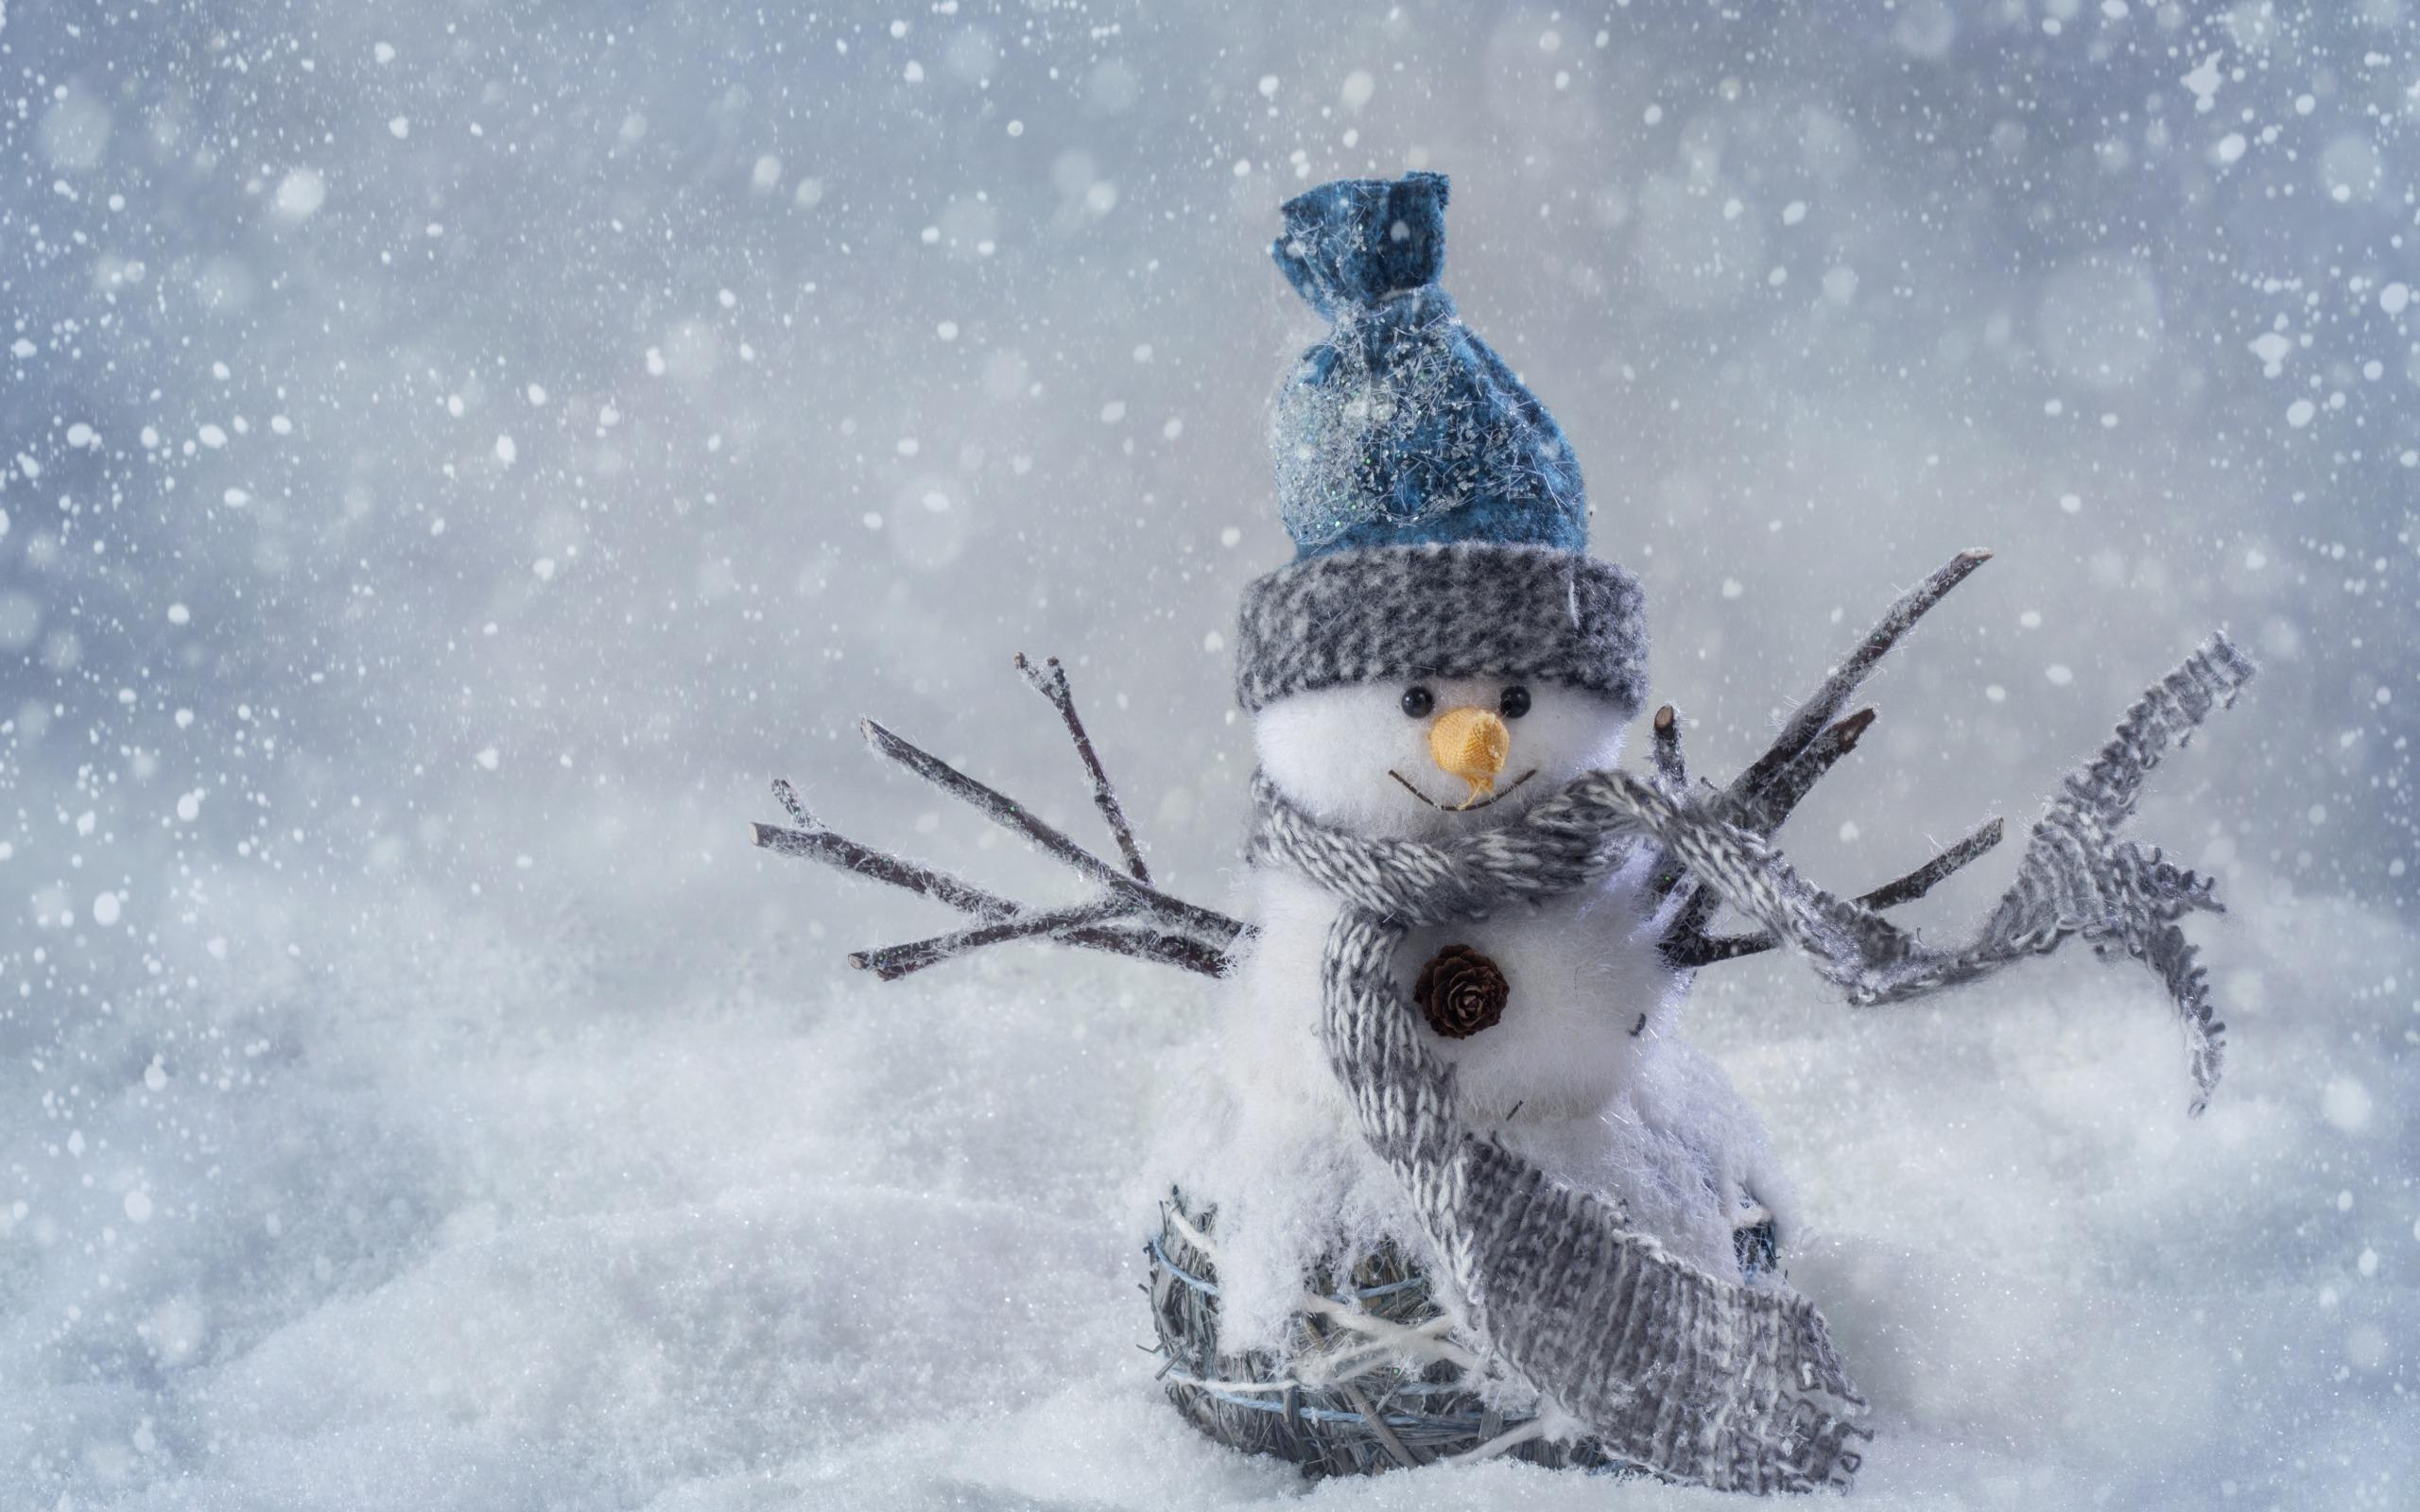 снеговик, зима, снег, hd обои